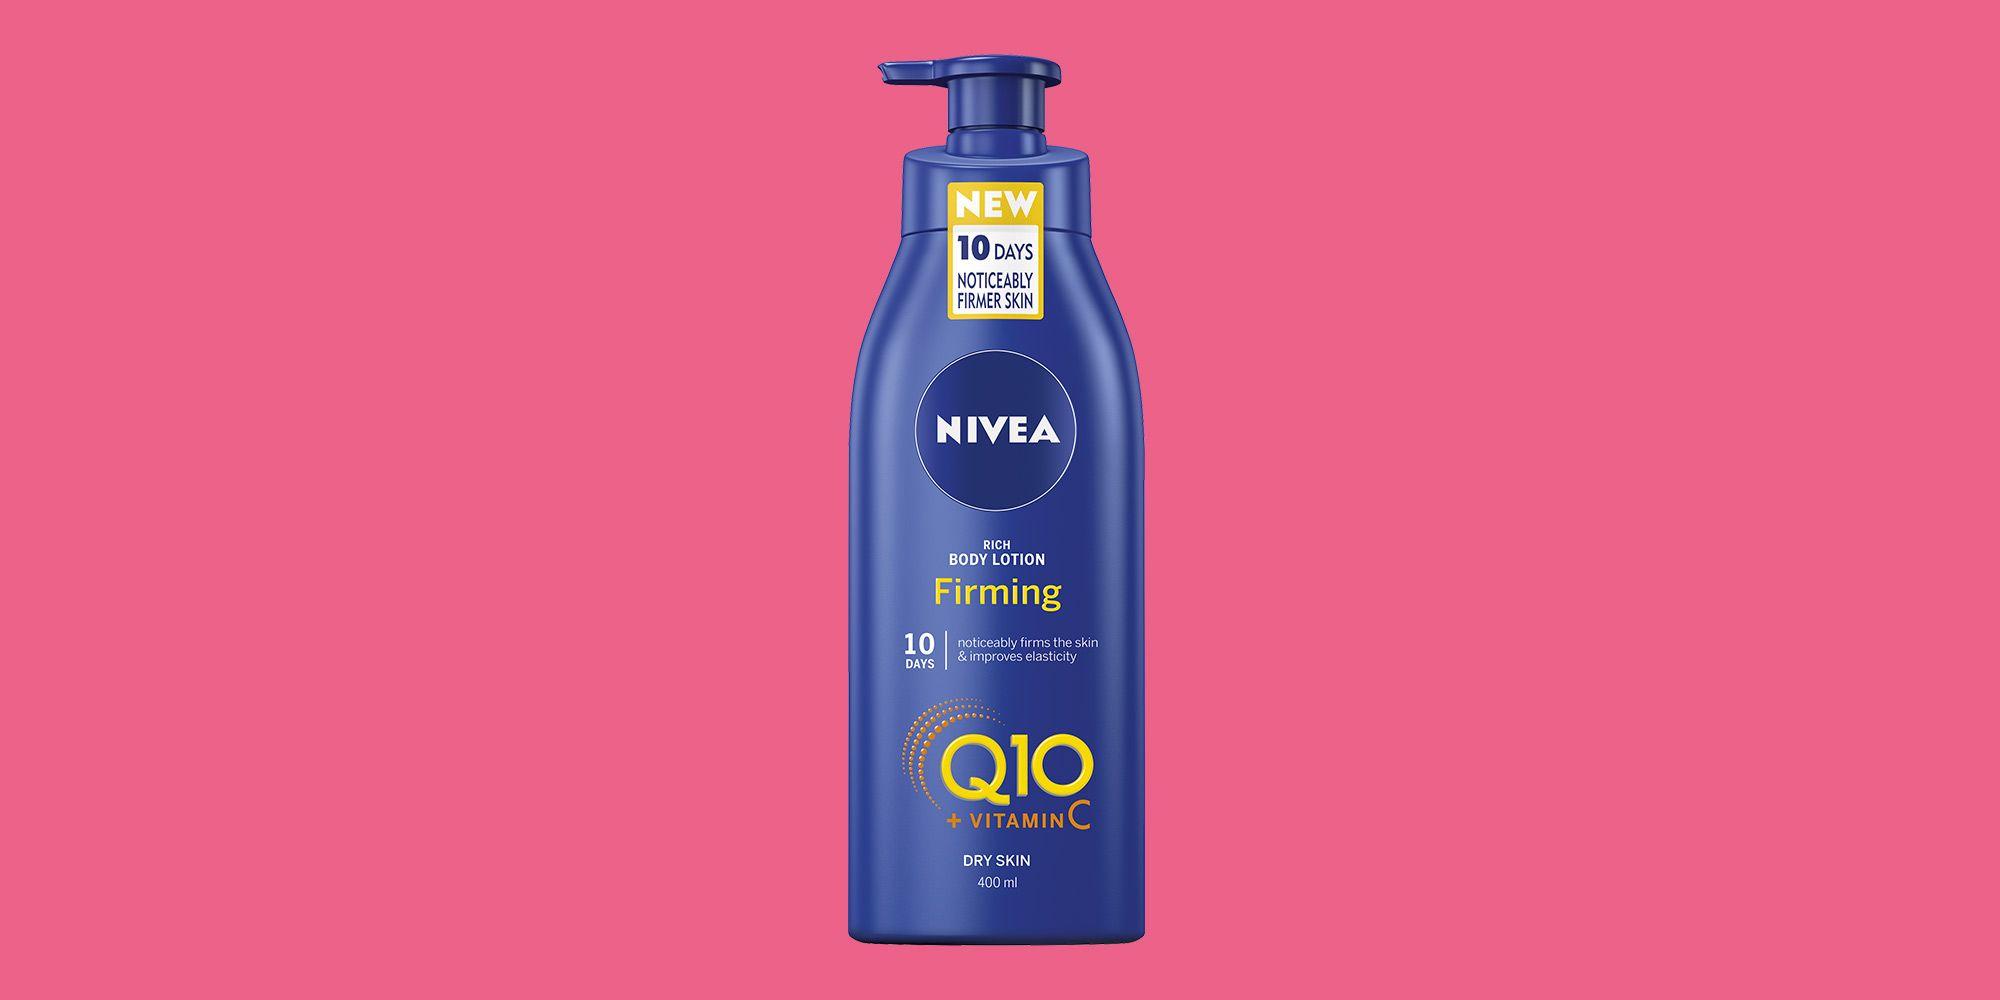 Nivea Q10+ Vitamin C Firming Body